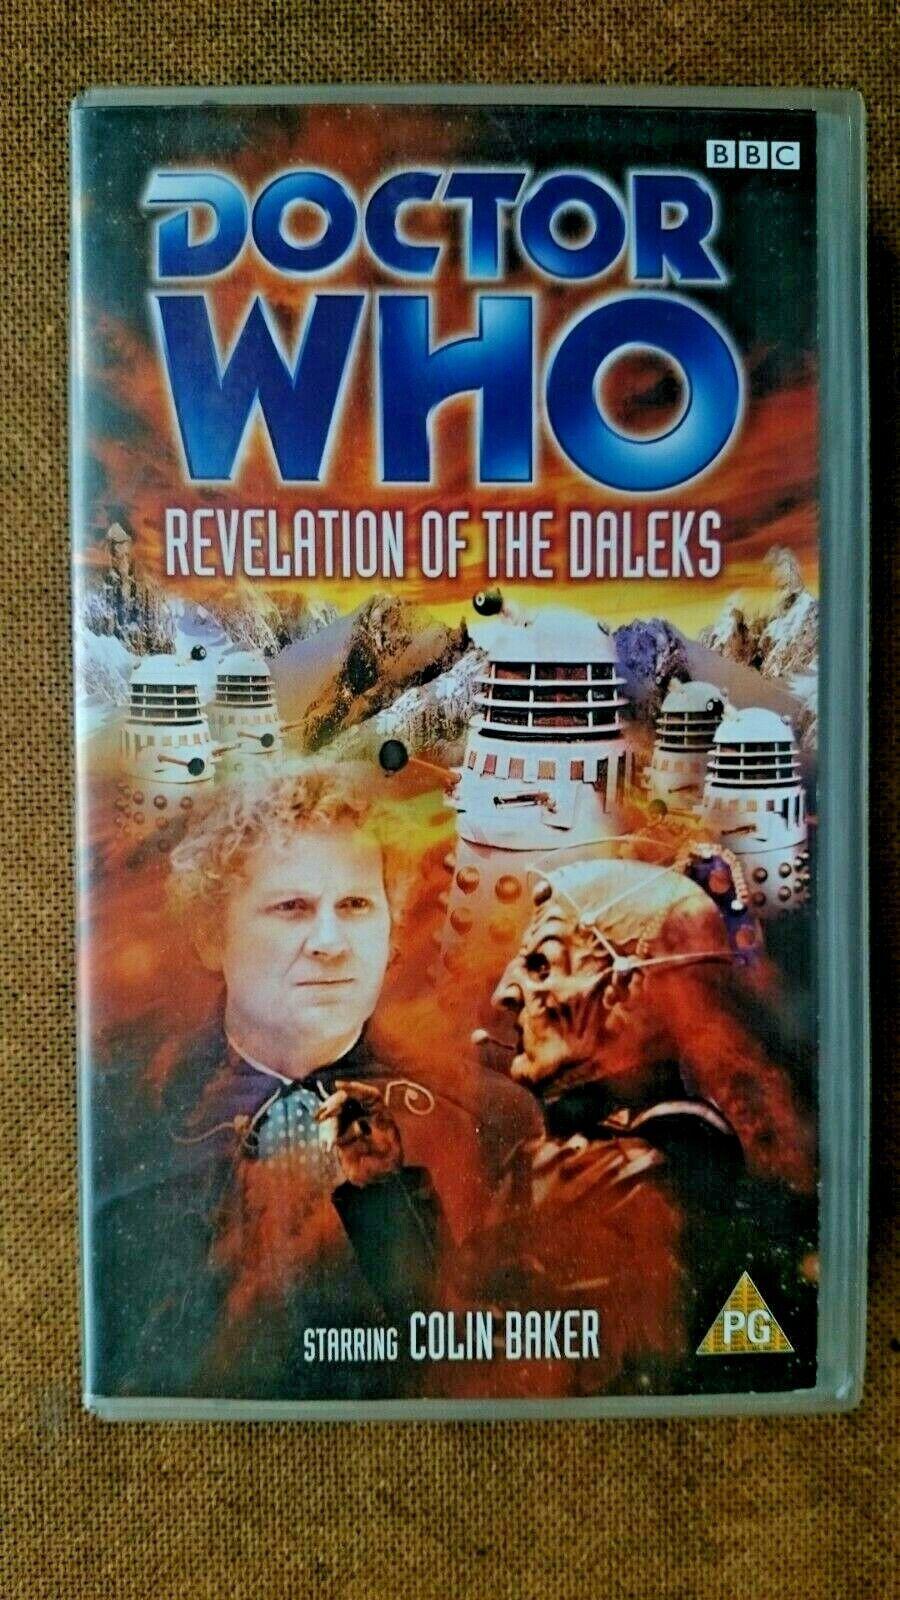 Doctor Who - Revelation Of The Daleks (VHS)